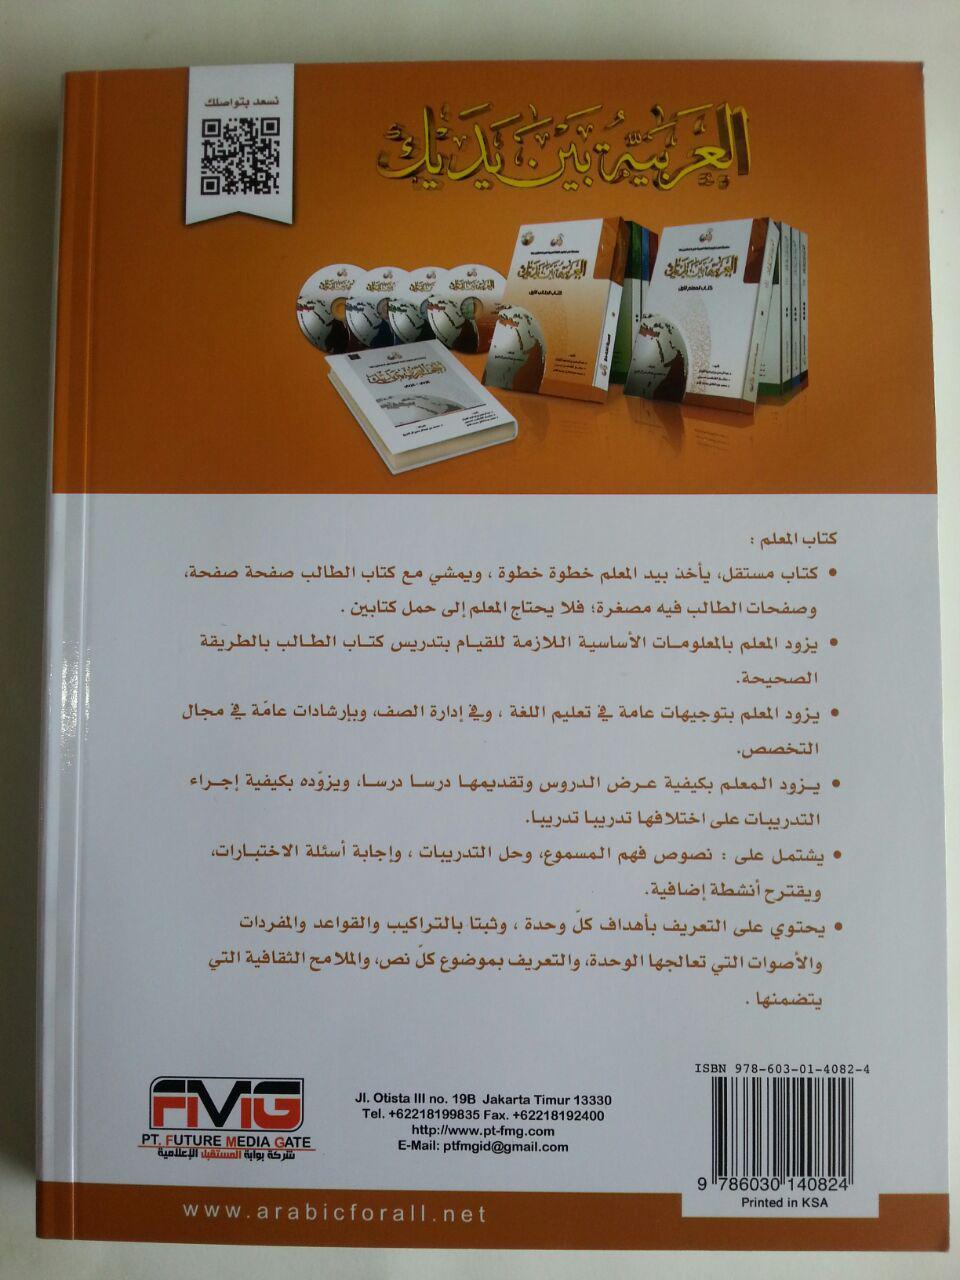 Kitab Al-Arabiyyah Baina Yadaik Kitabul Muallim cover